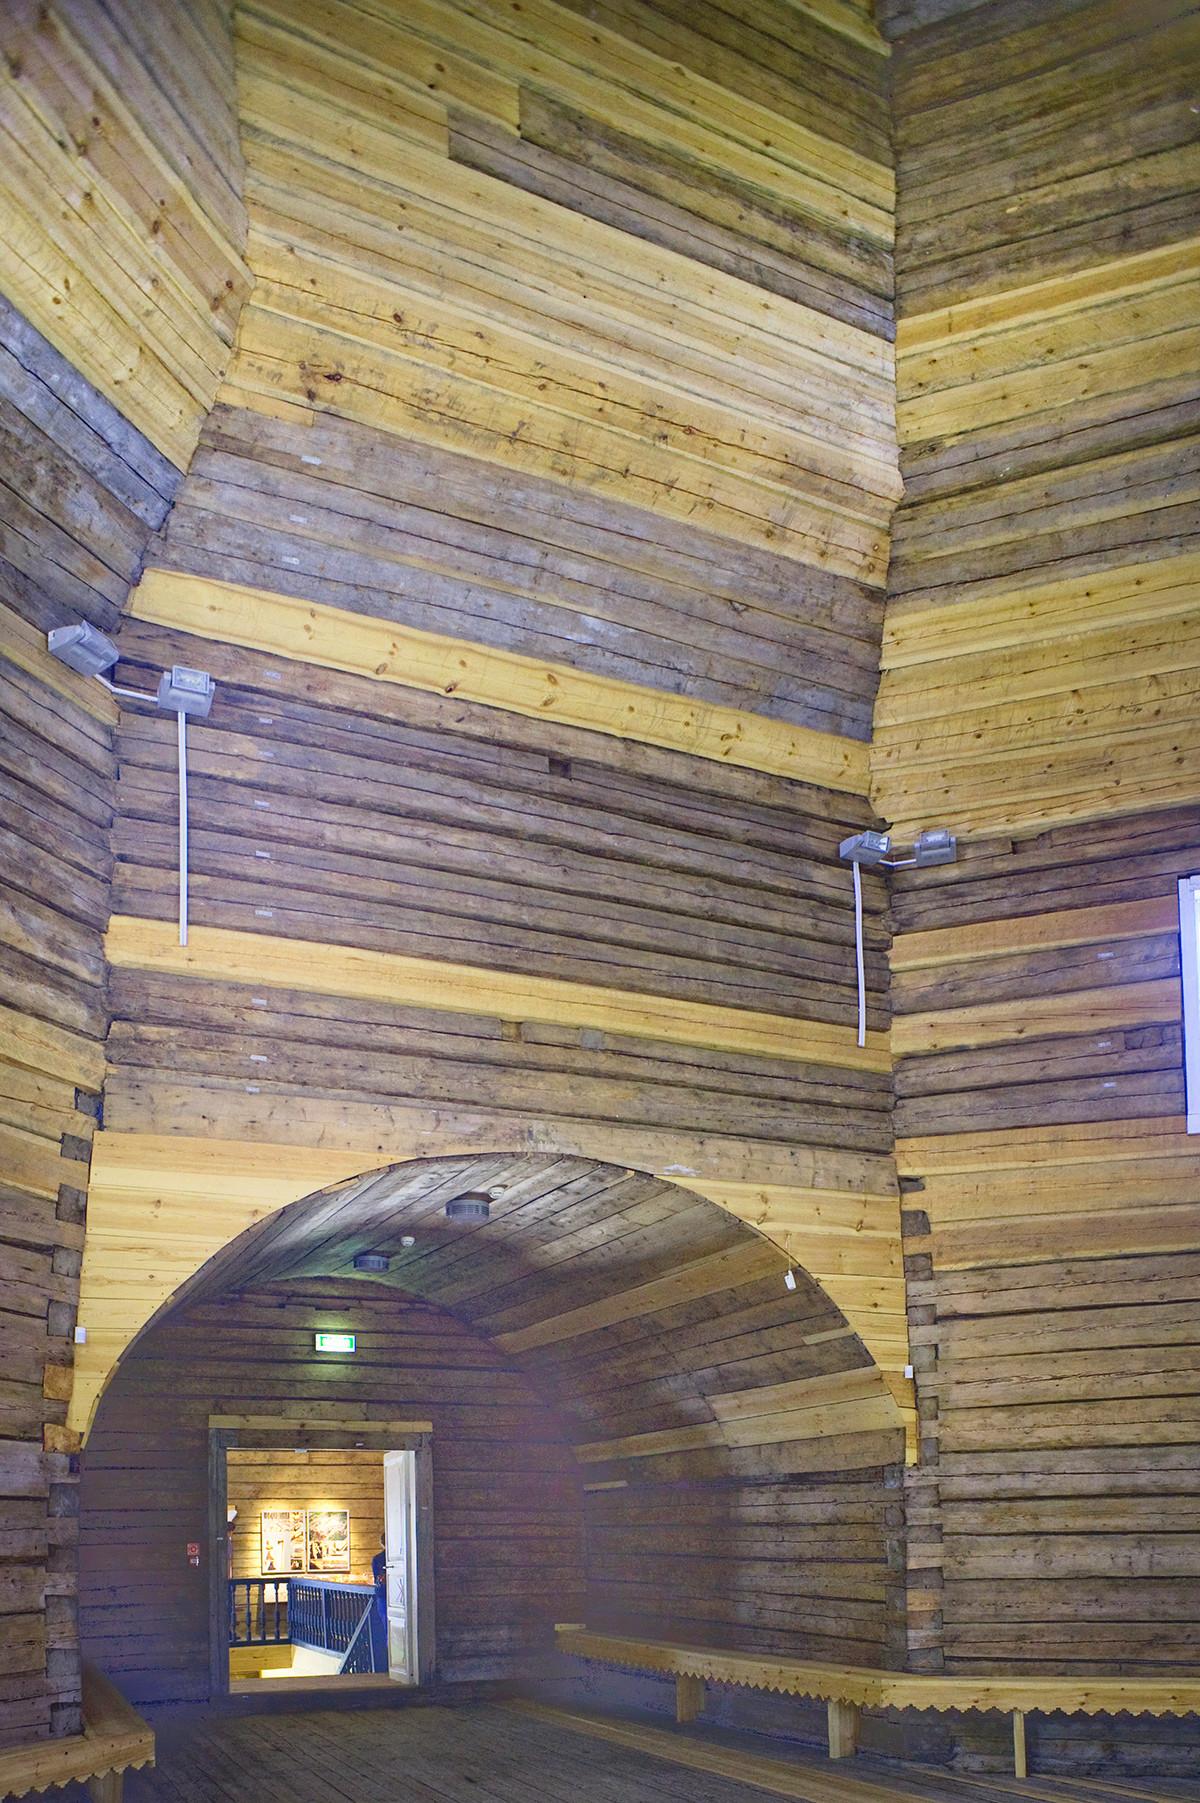 Church of Elijah the Prophet. Interior, west wall, view toward vestibule. Original log beams (dark) inserted into the restoration.  June 1, 2014